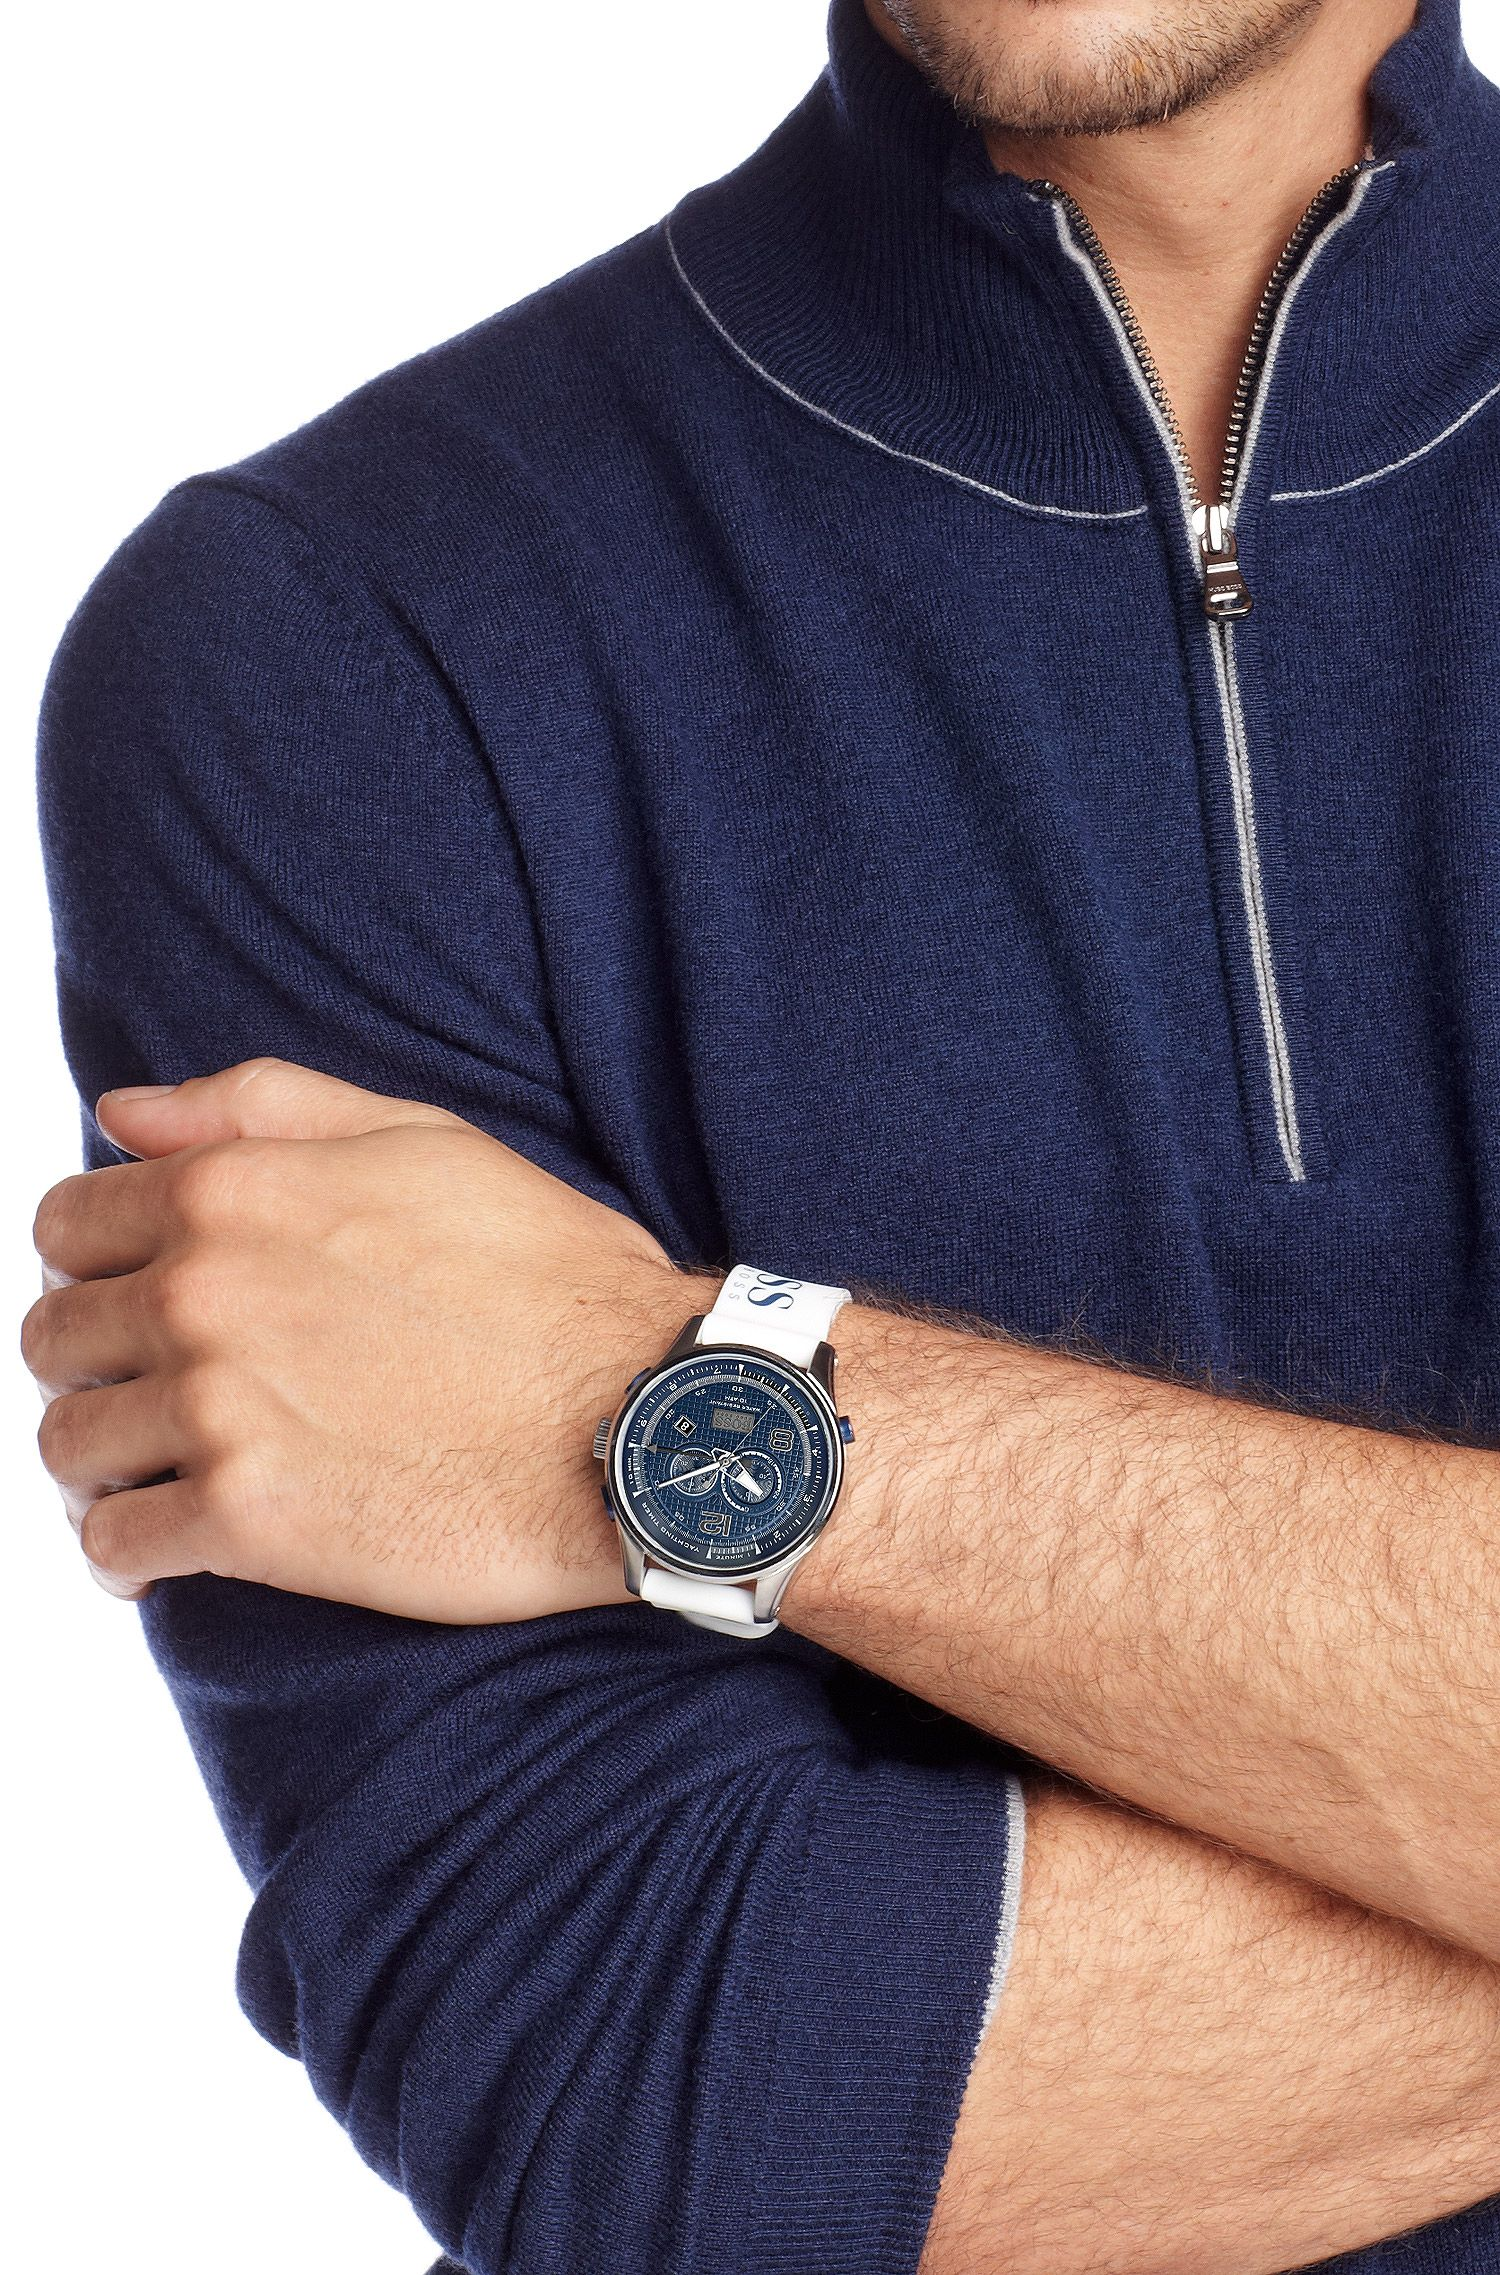 Armbanduhr ´HB 2012` mit Gummiarmband